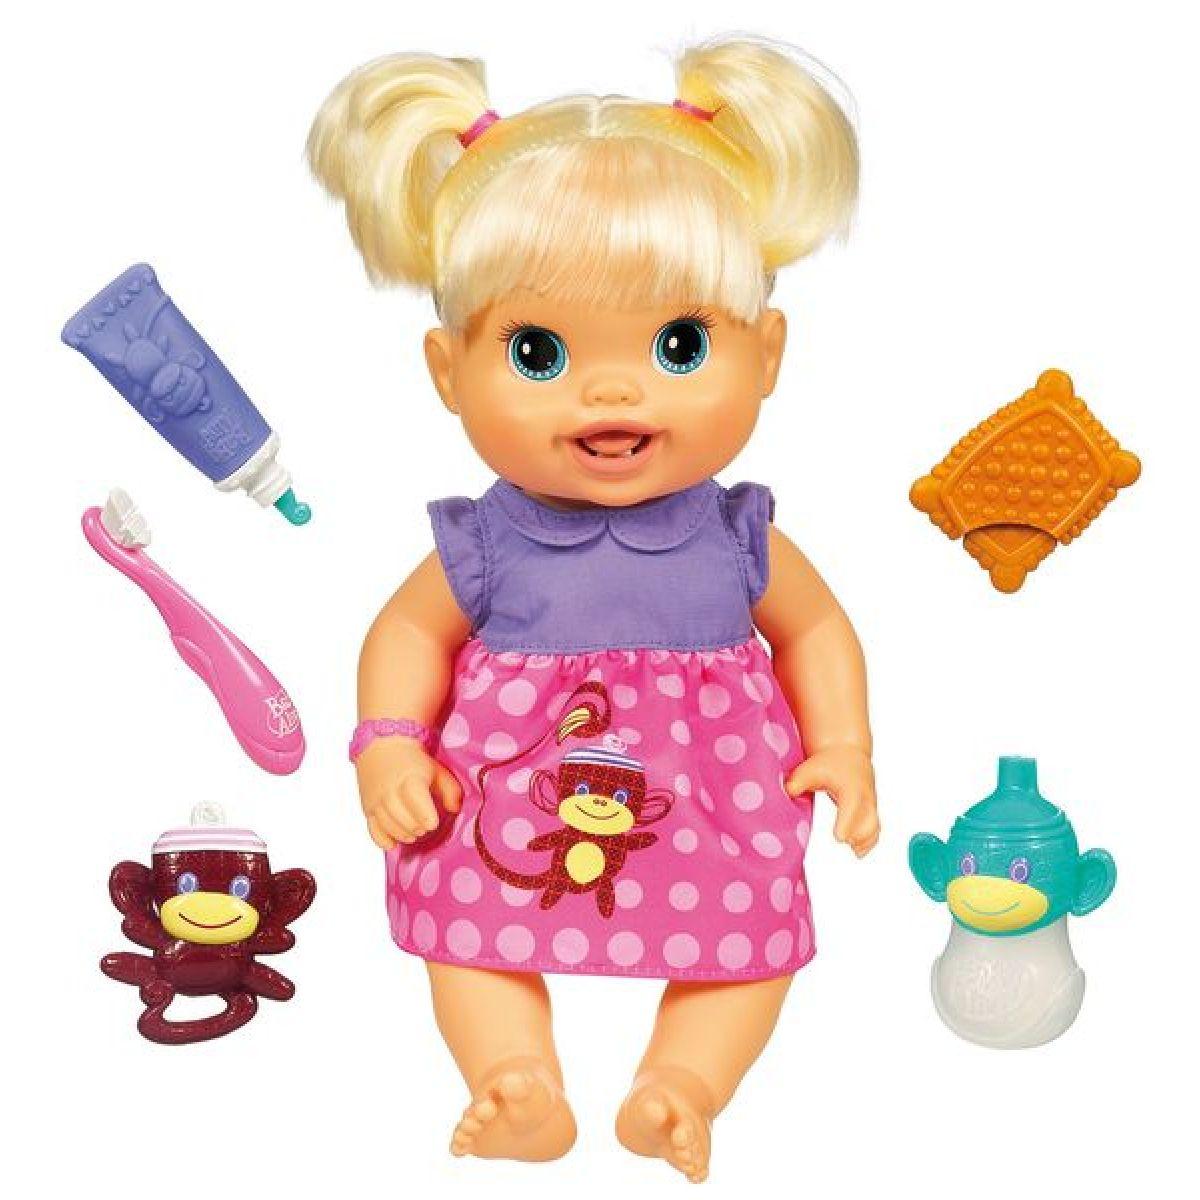 Hasbro 28385 - Baby Alive Panenka s rostoucími zoubky